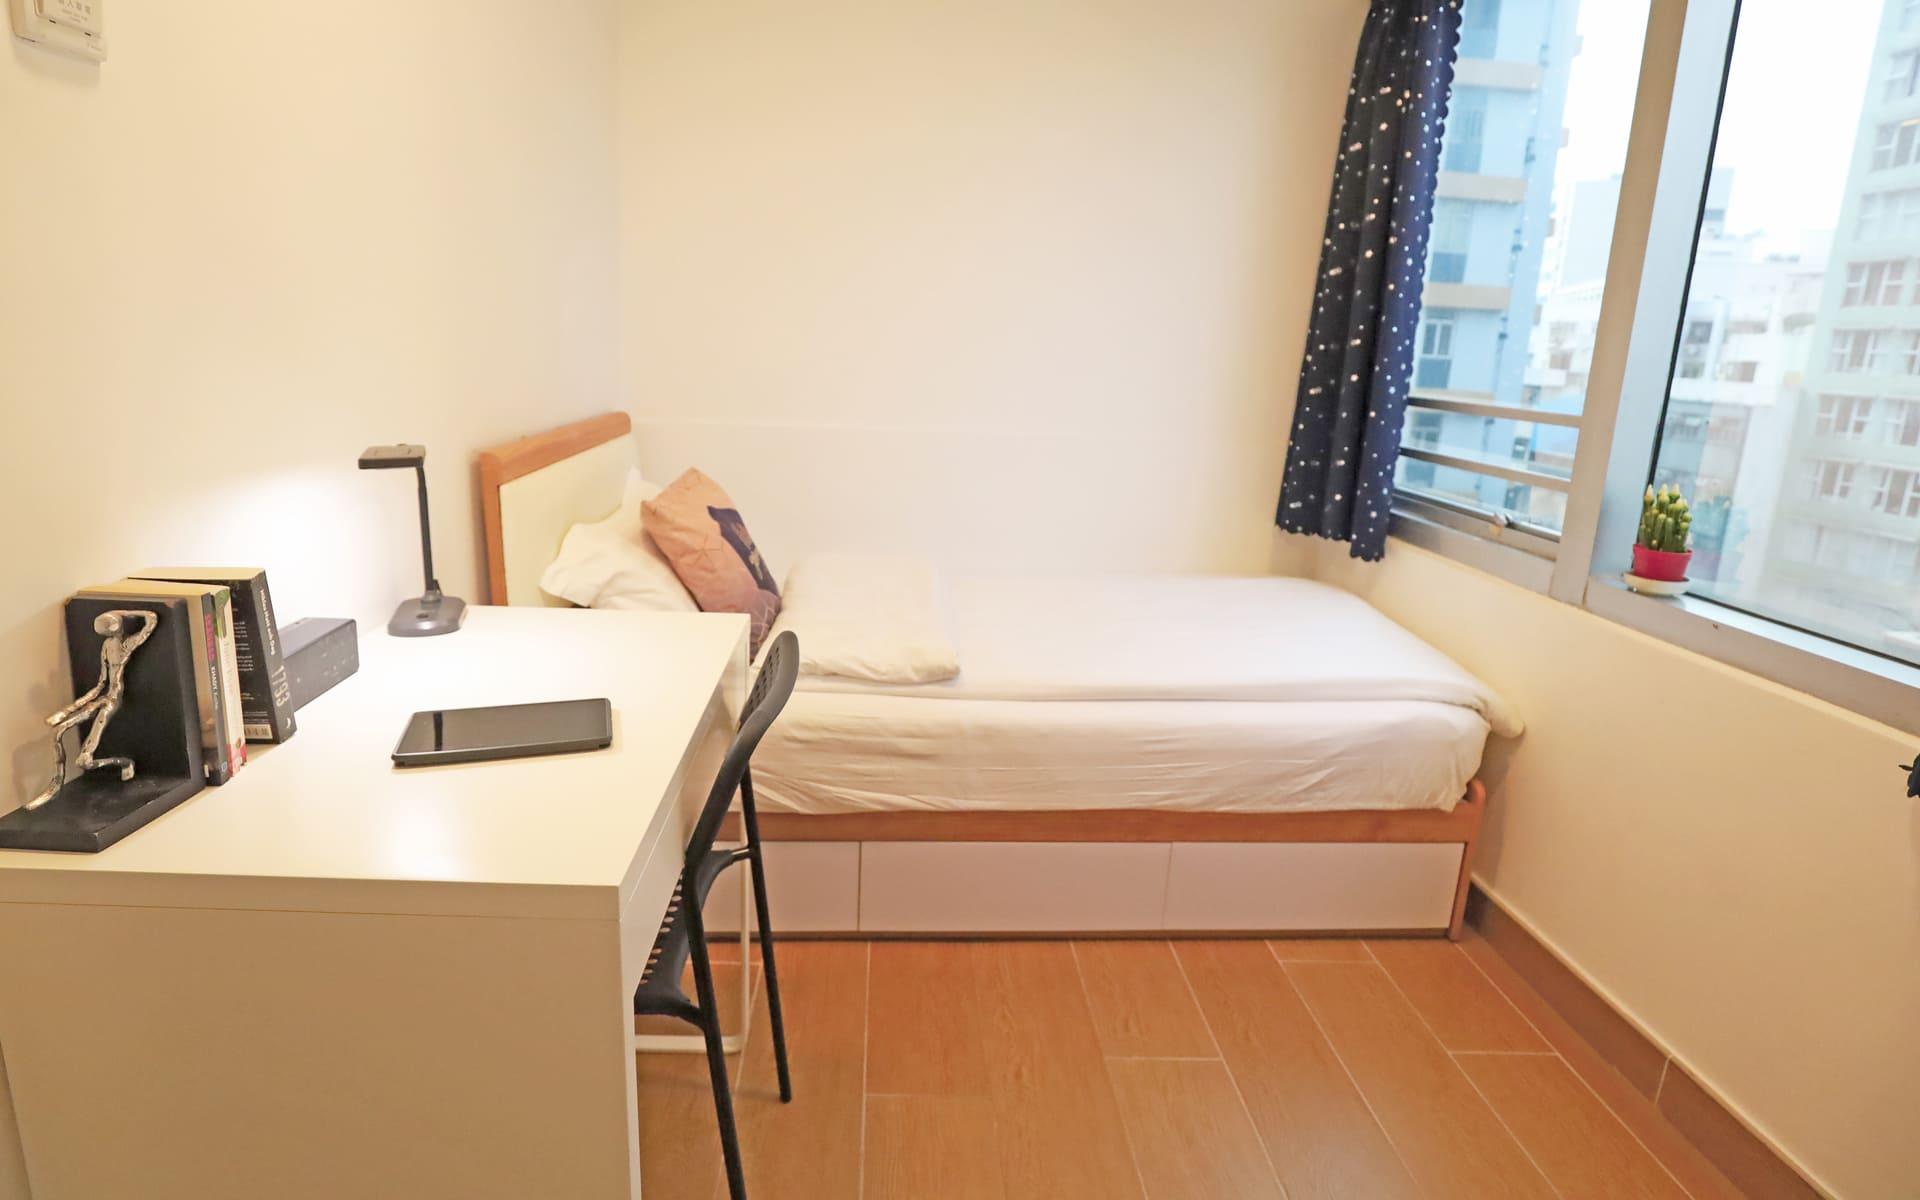 hk_service_apartment_5734946001596784579.jpg